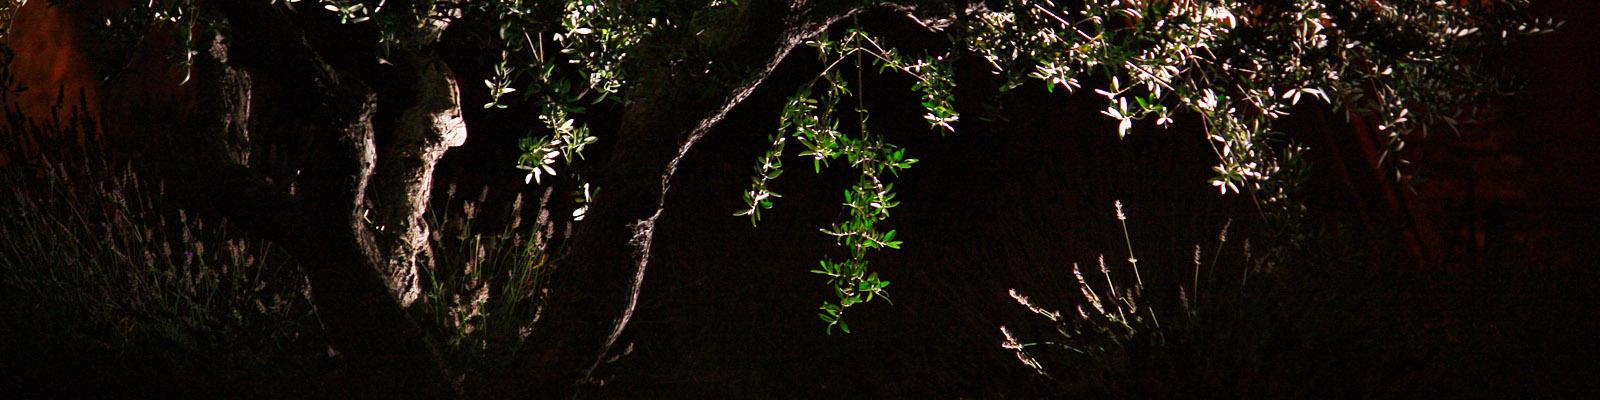 Green Parrot Gardens | Garden Lighting